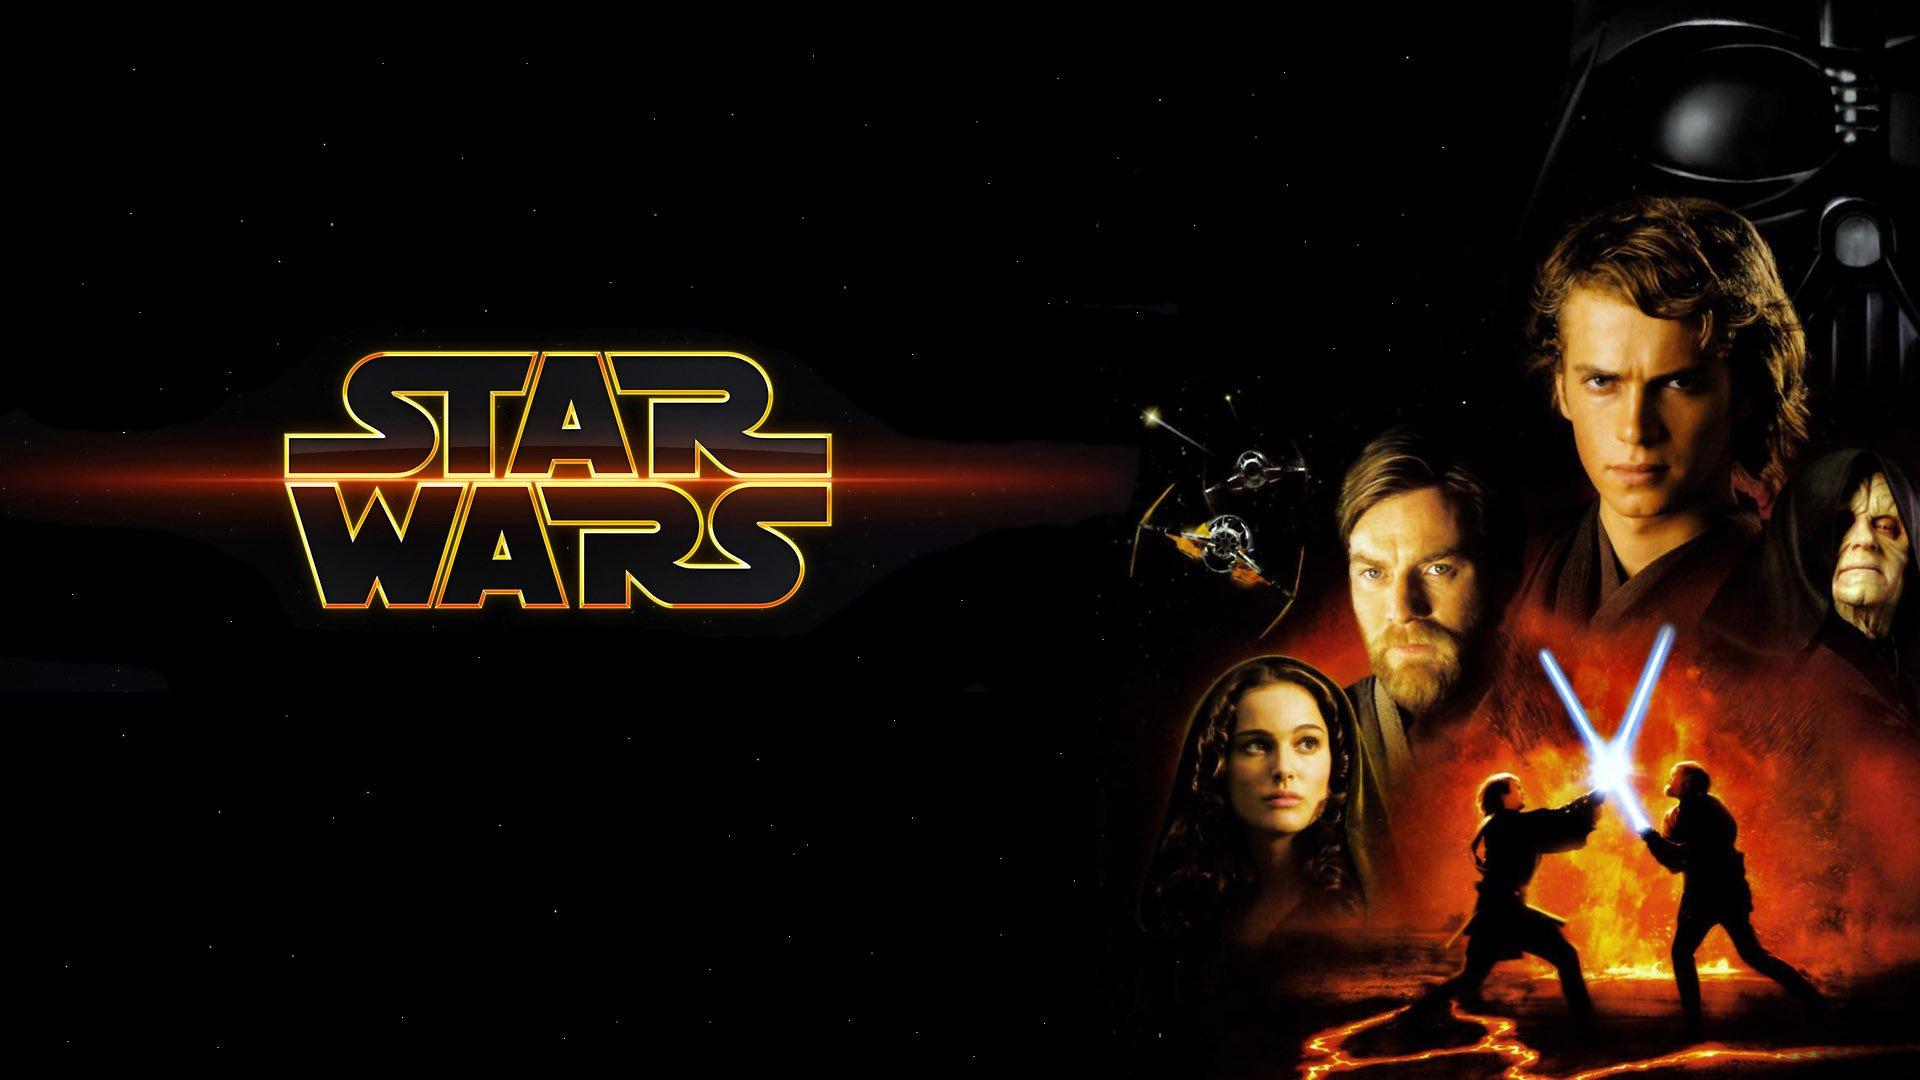 STAR WARS REVENGE SITH sci-fi futuristic action movie film (34) wallpaper | 1920x1080 | 255861 | WallpaperUP